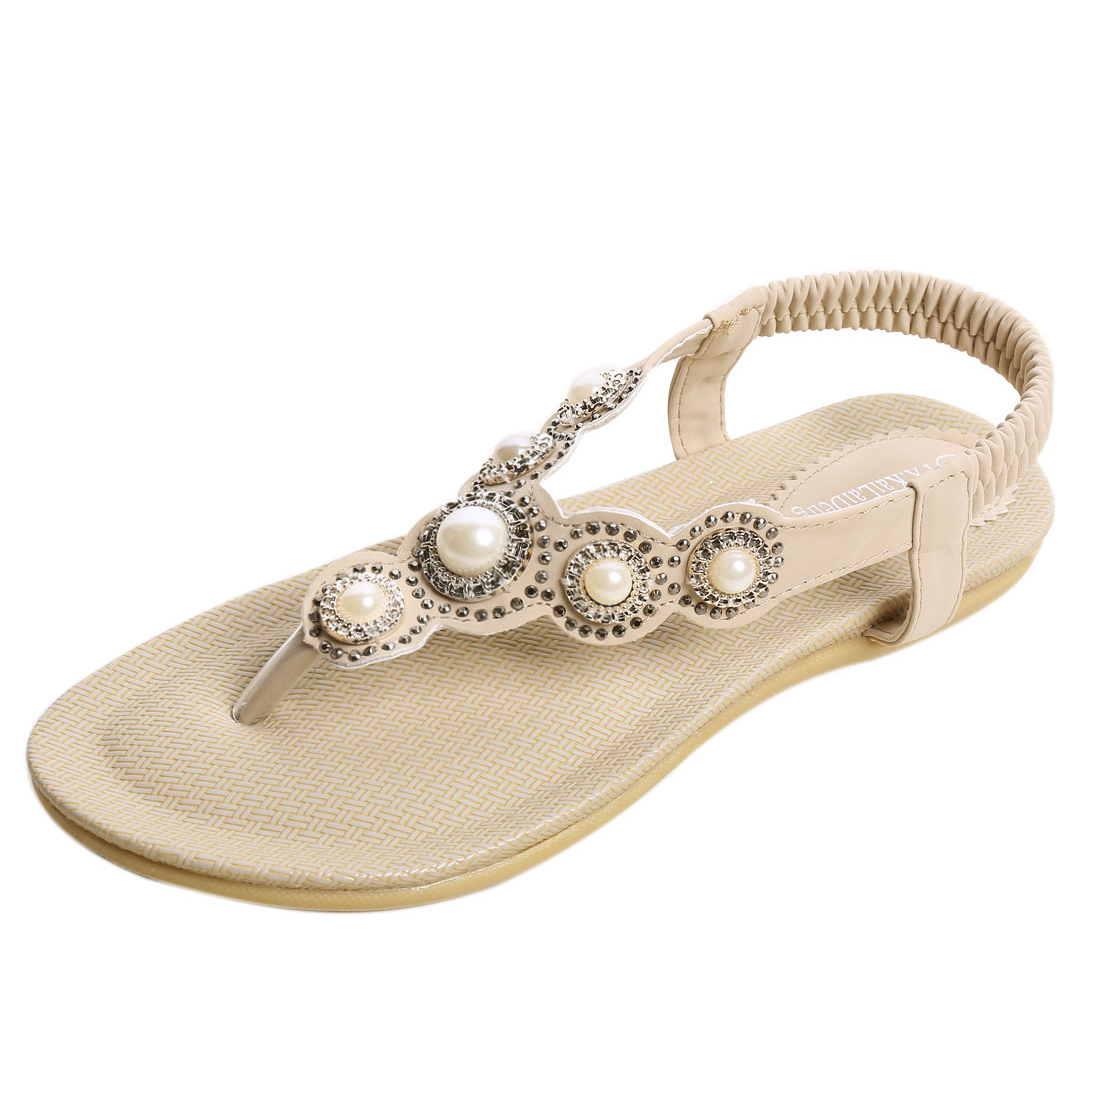 Women Rhinestones Embellished Elastic Strap Flat Sandals Beige US 7